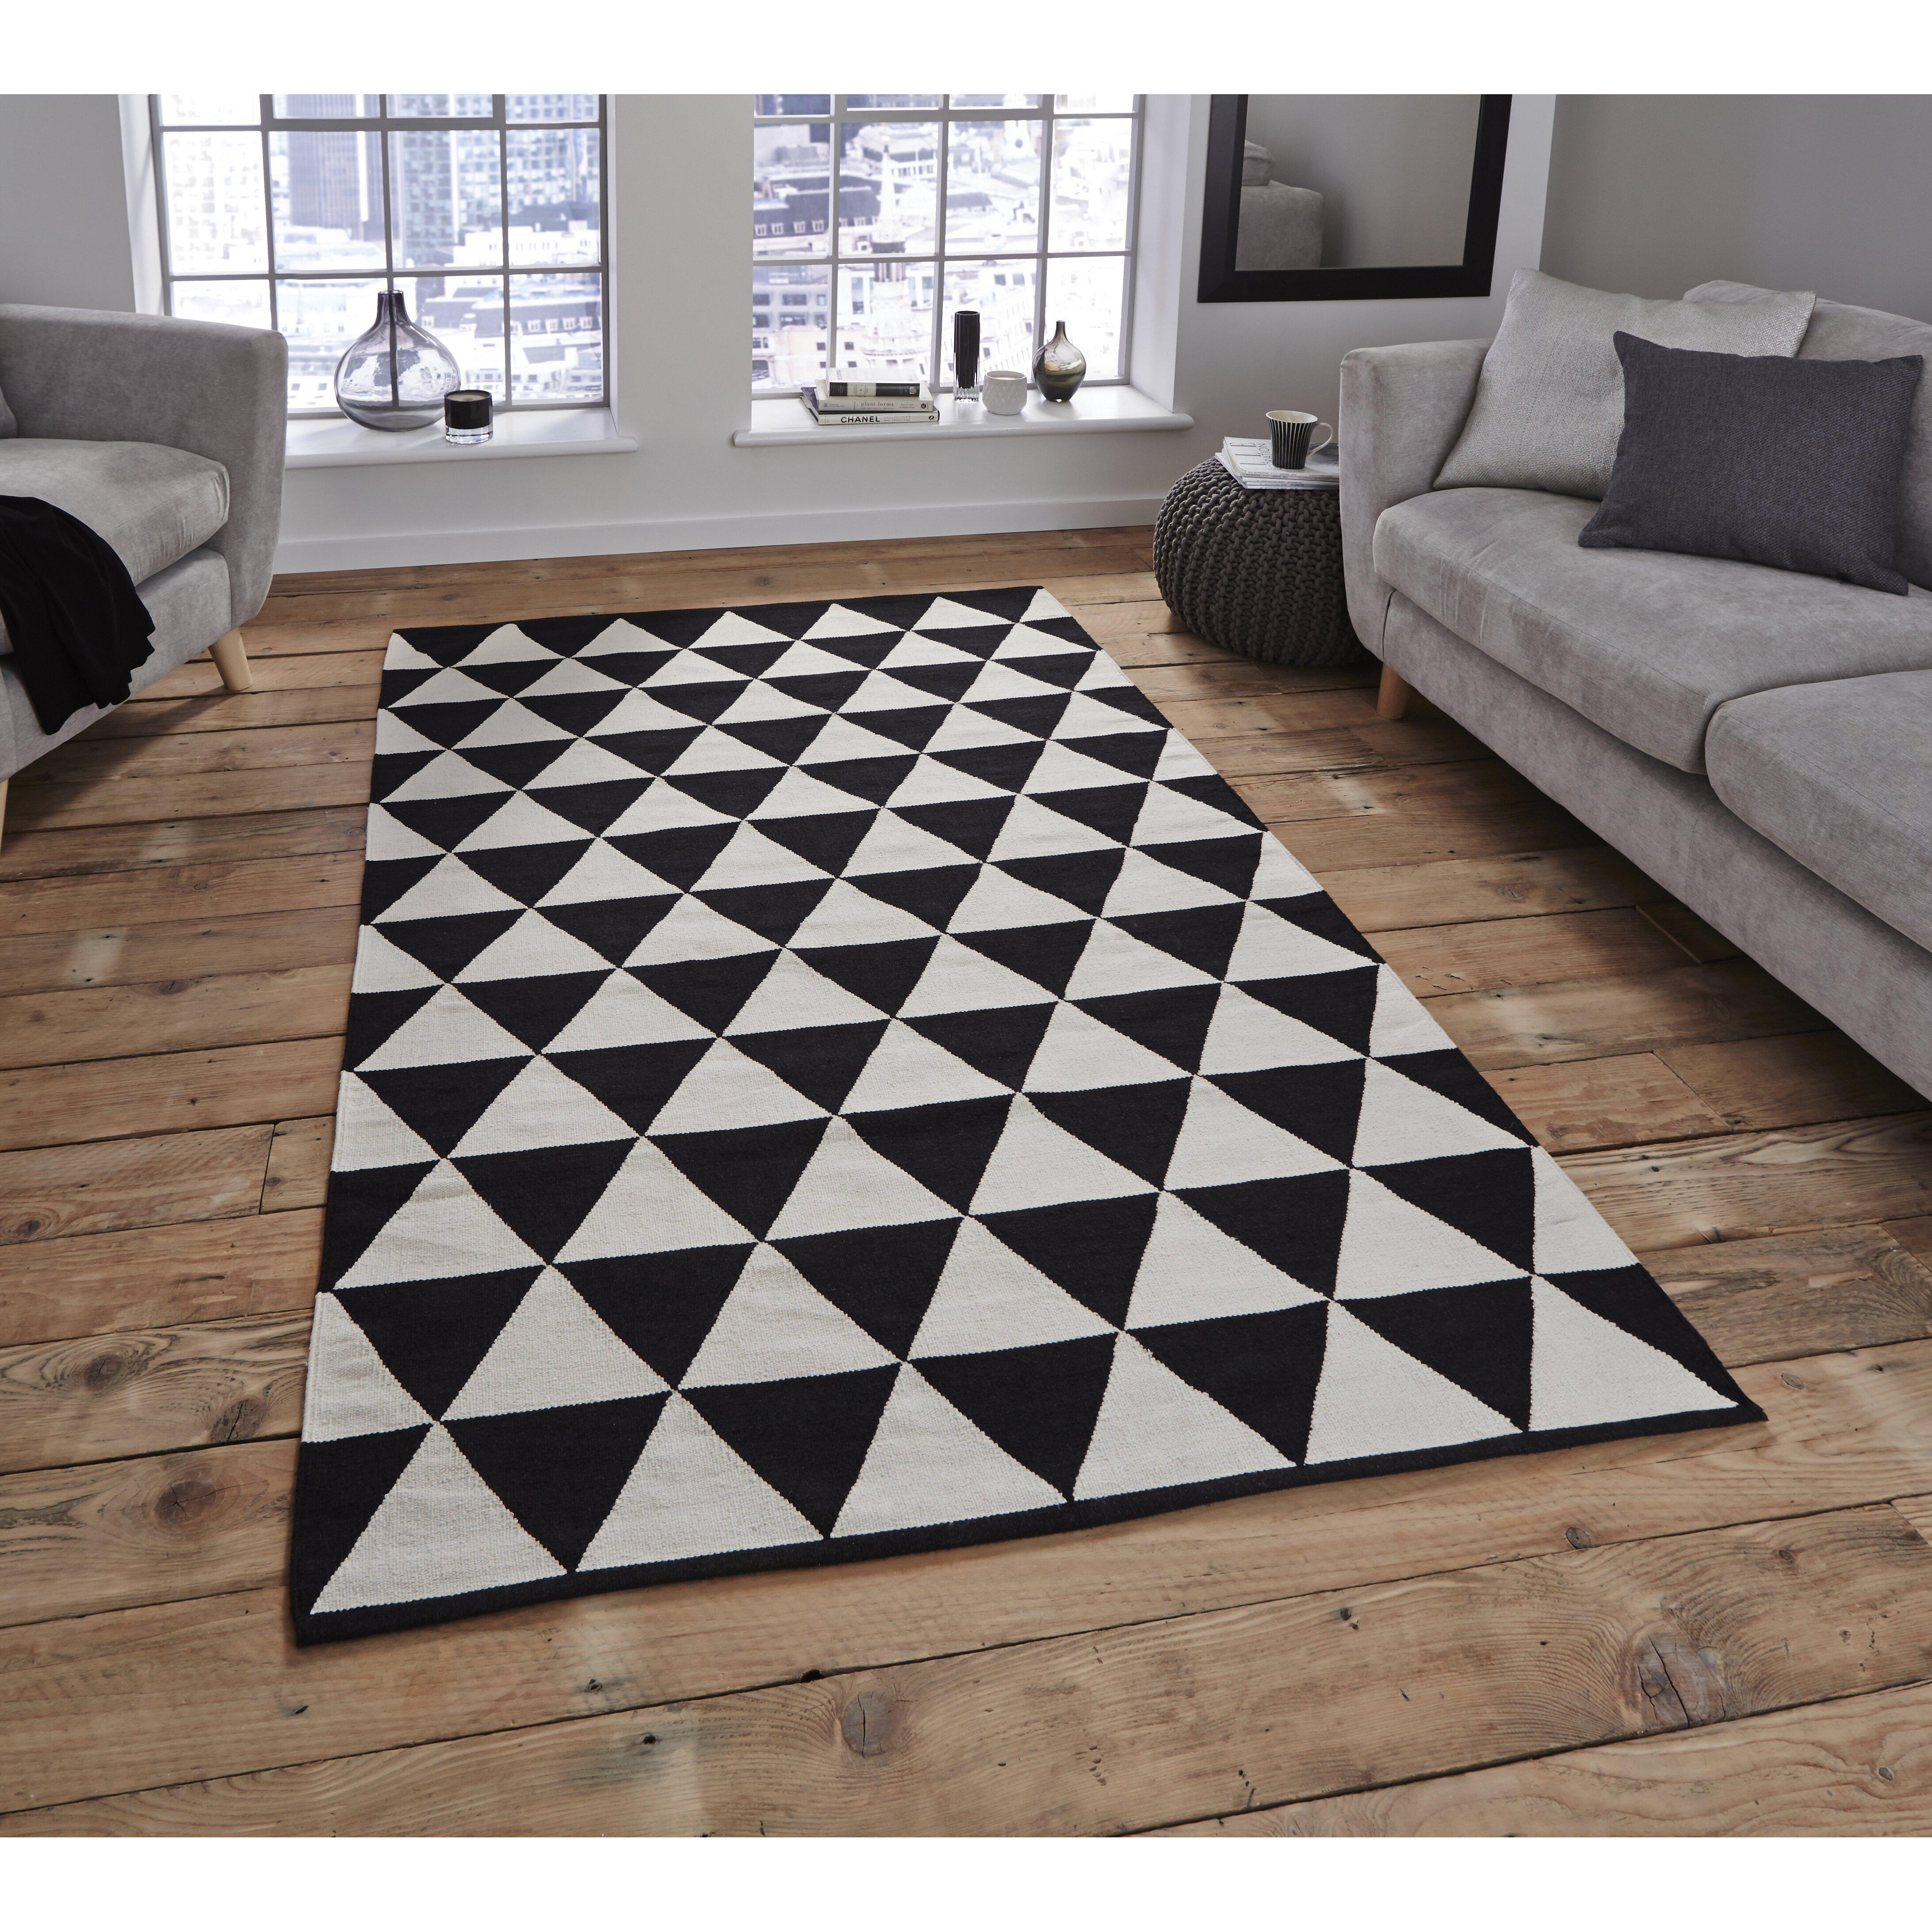 think rugs manhattan black white area rug reviews. Black Bedroom Furniture Sets. Home Design Ideas